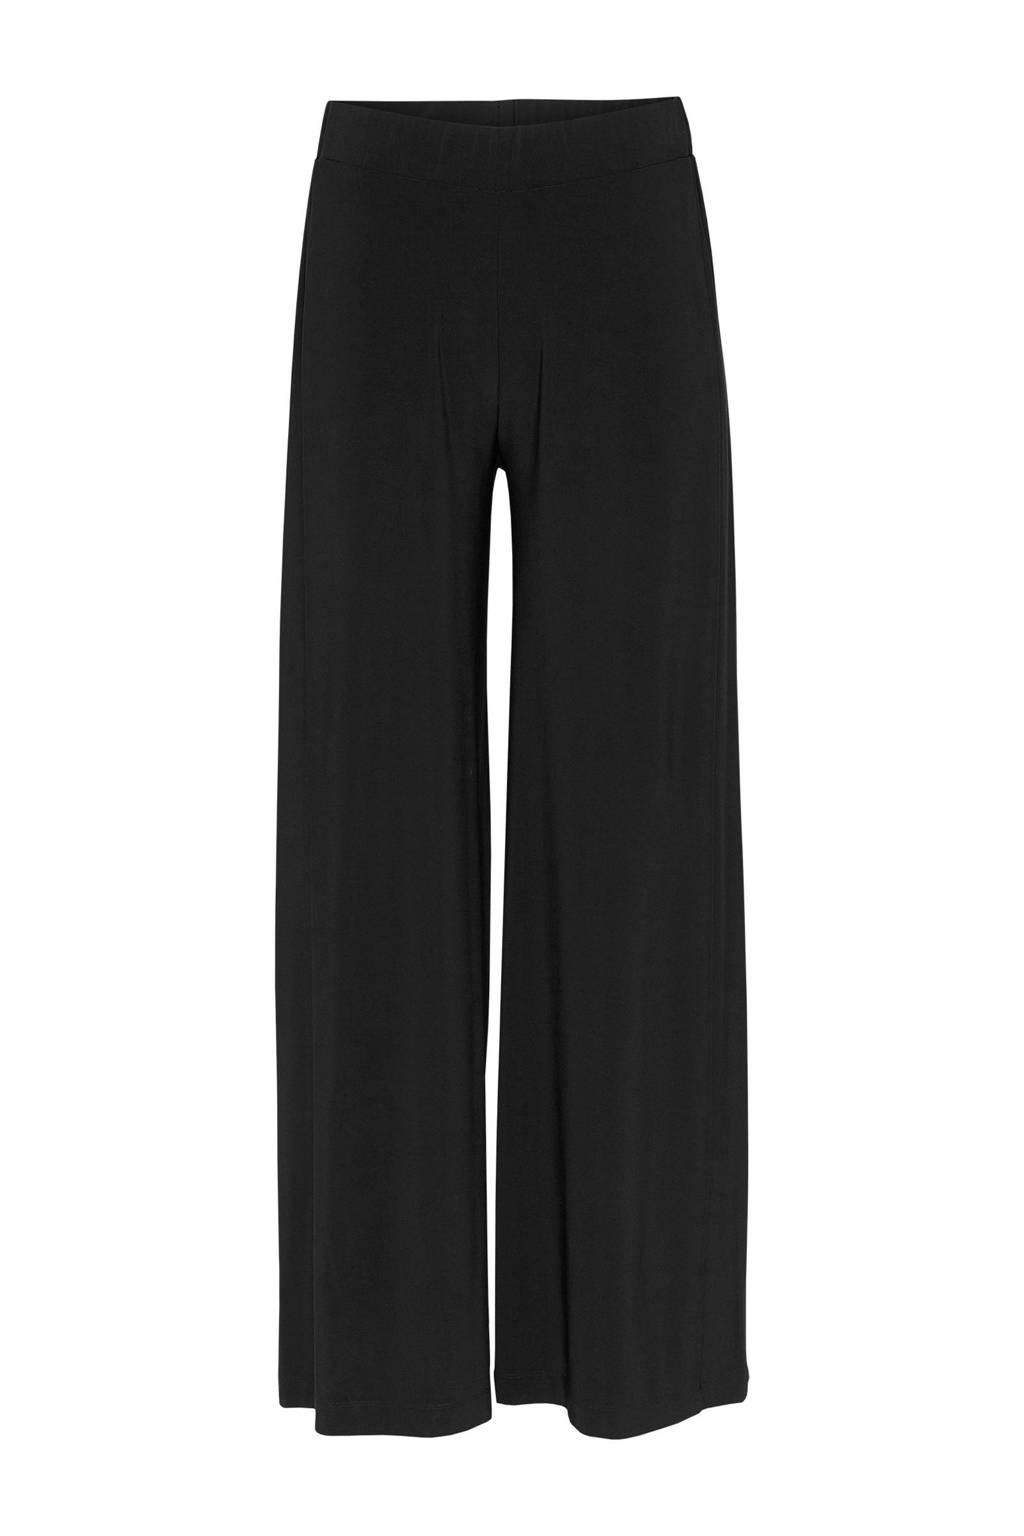 Didi high waist palazzo broek zwart, Zwart